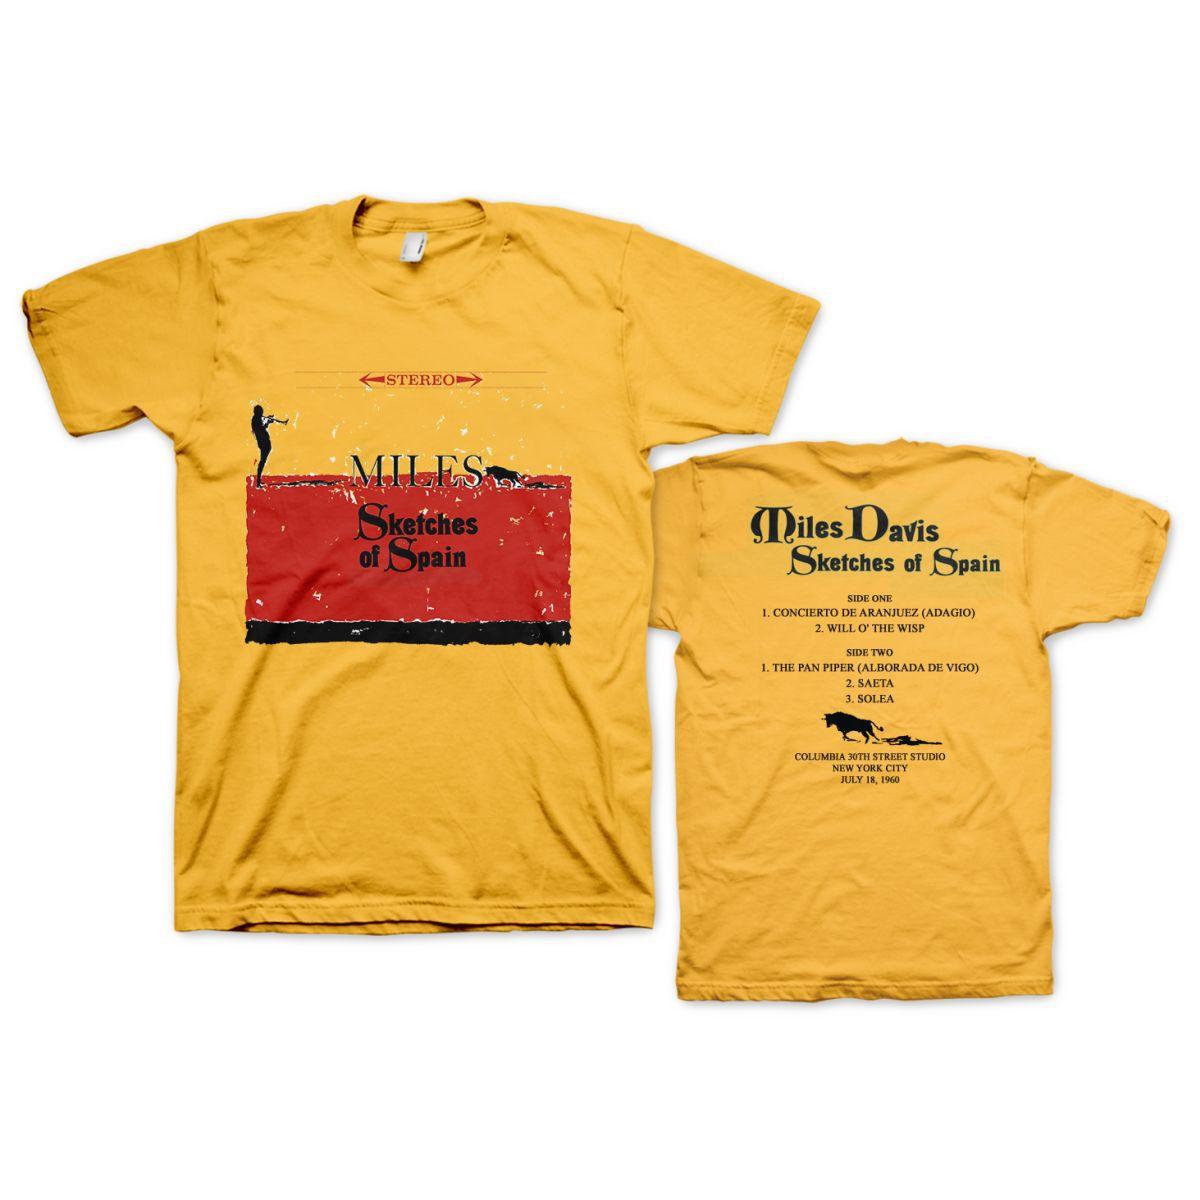 Miles Davis Sketches of Spain T-shirt